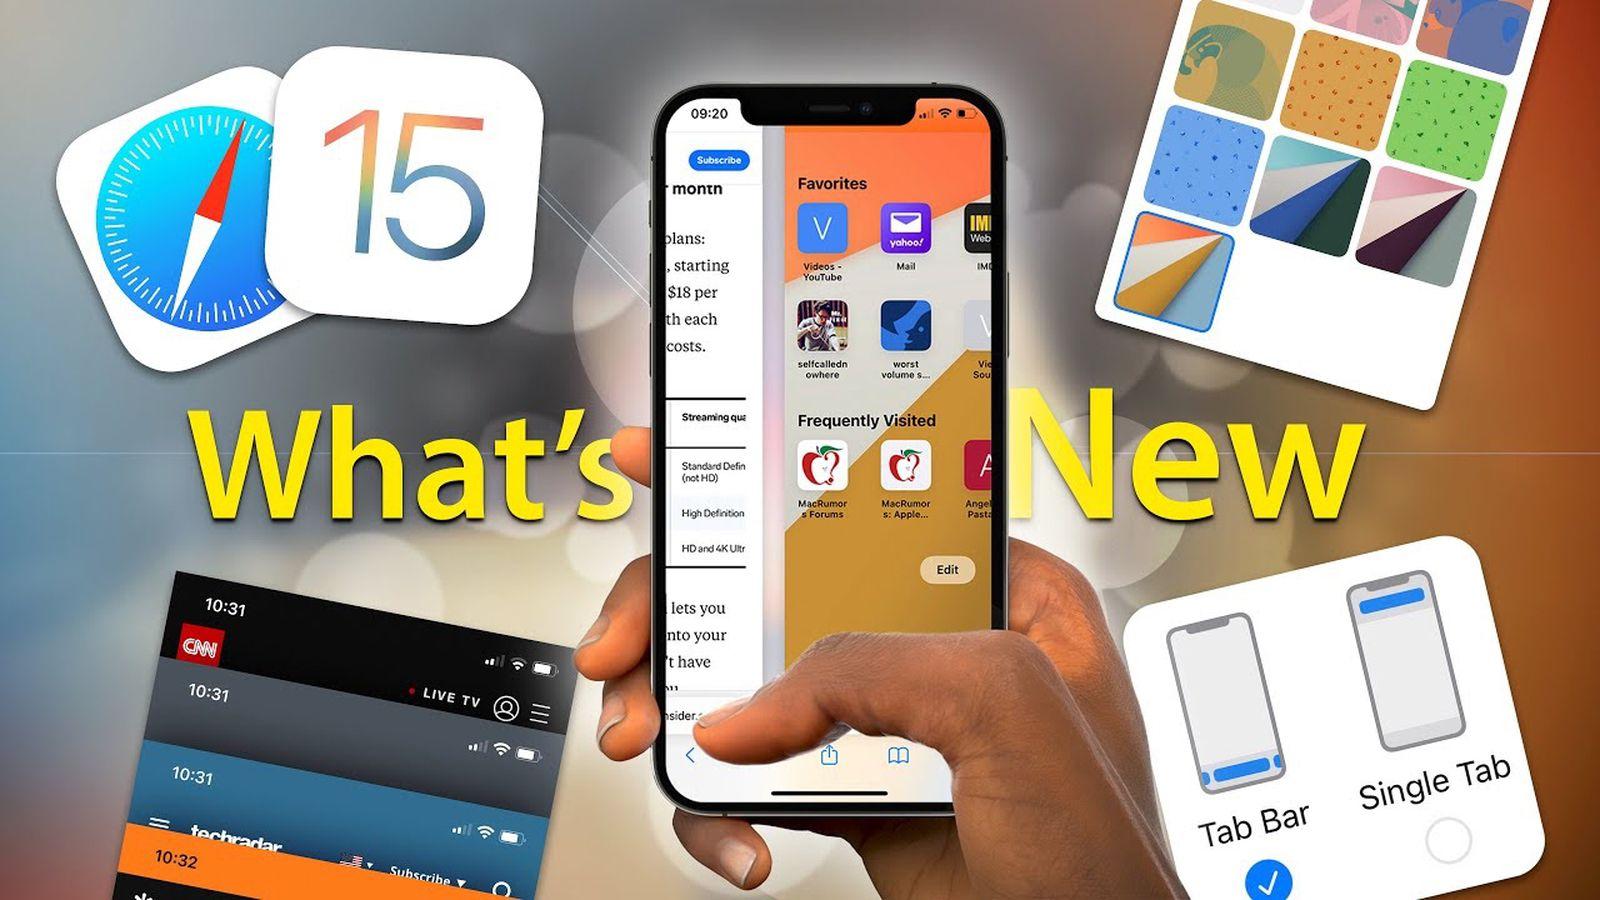 iOS 15 Safari Tips and Tricks Video